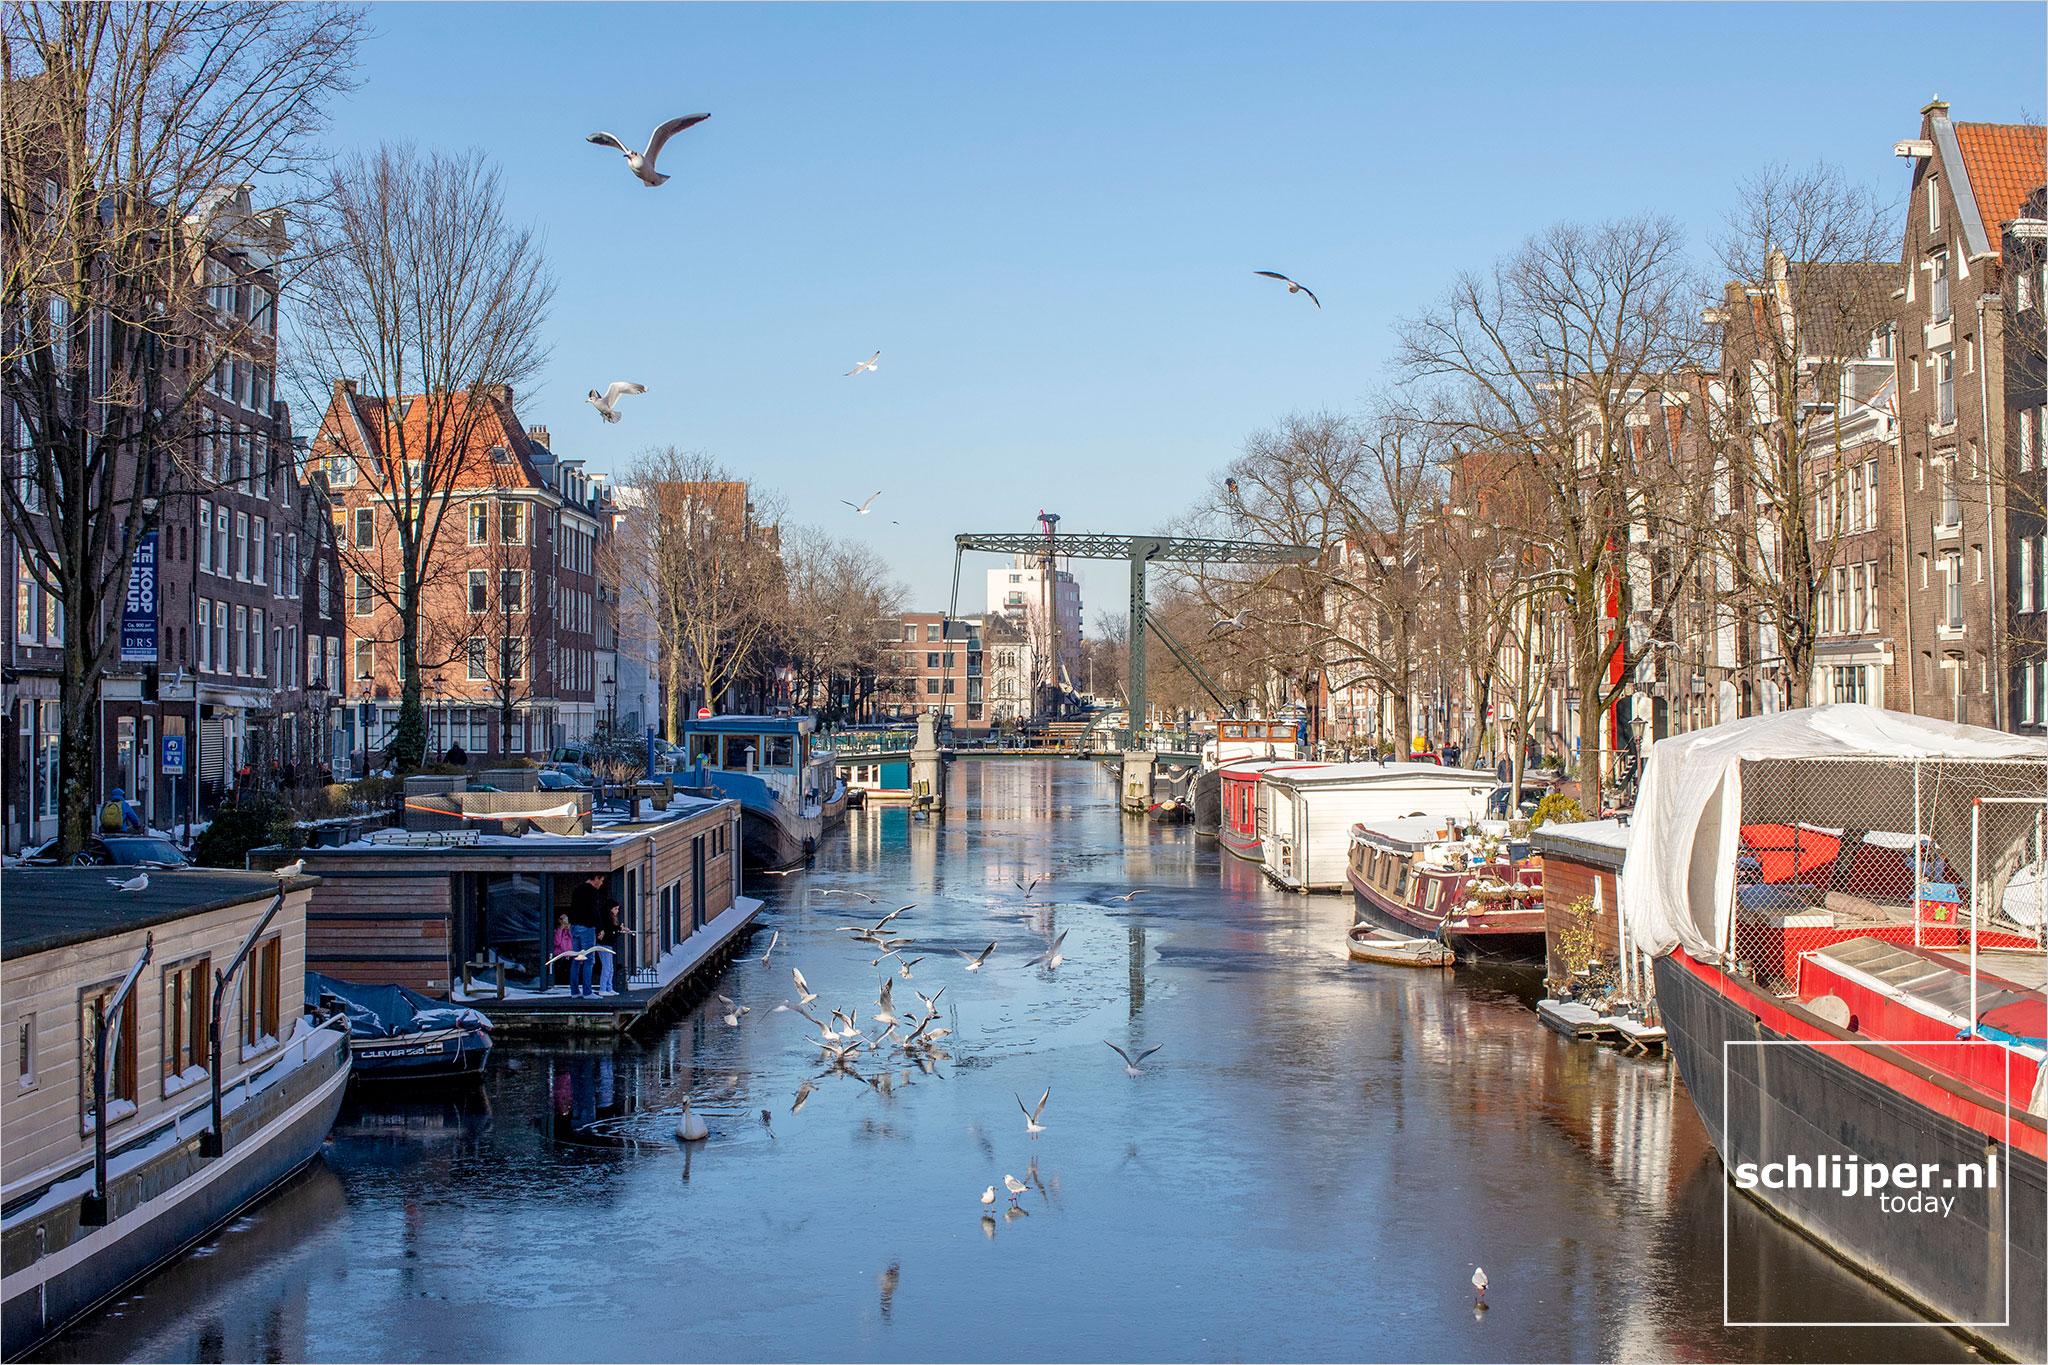 The Netherlands, Amsterdam, 11 februari 2021